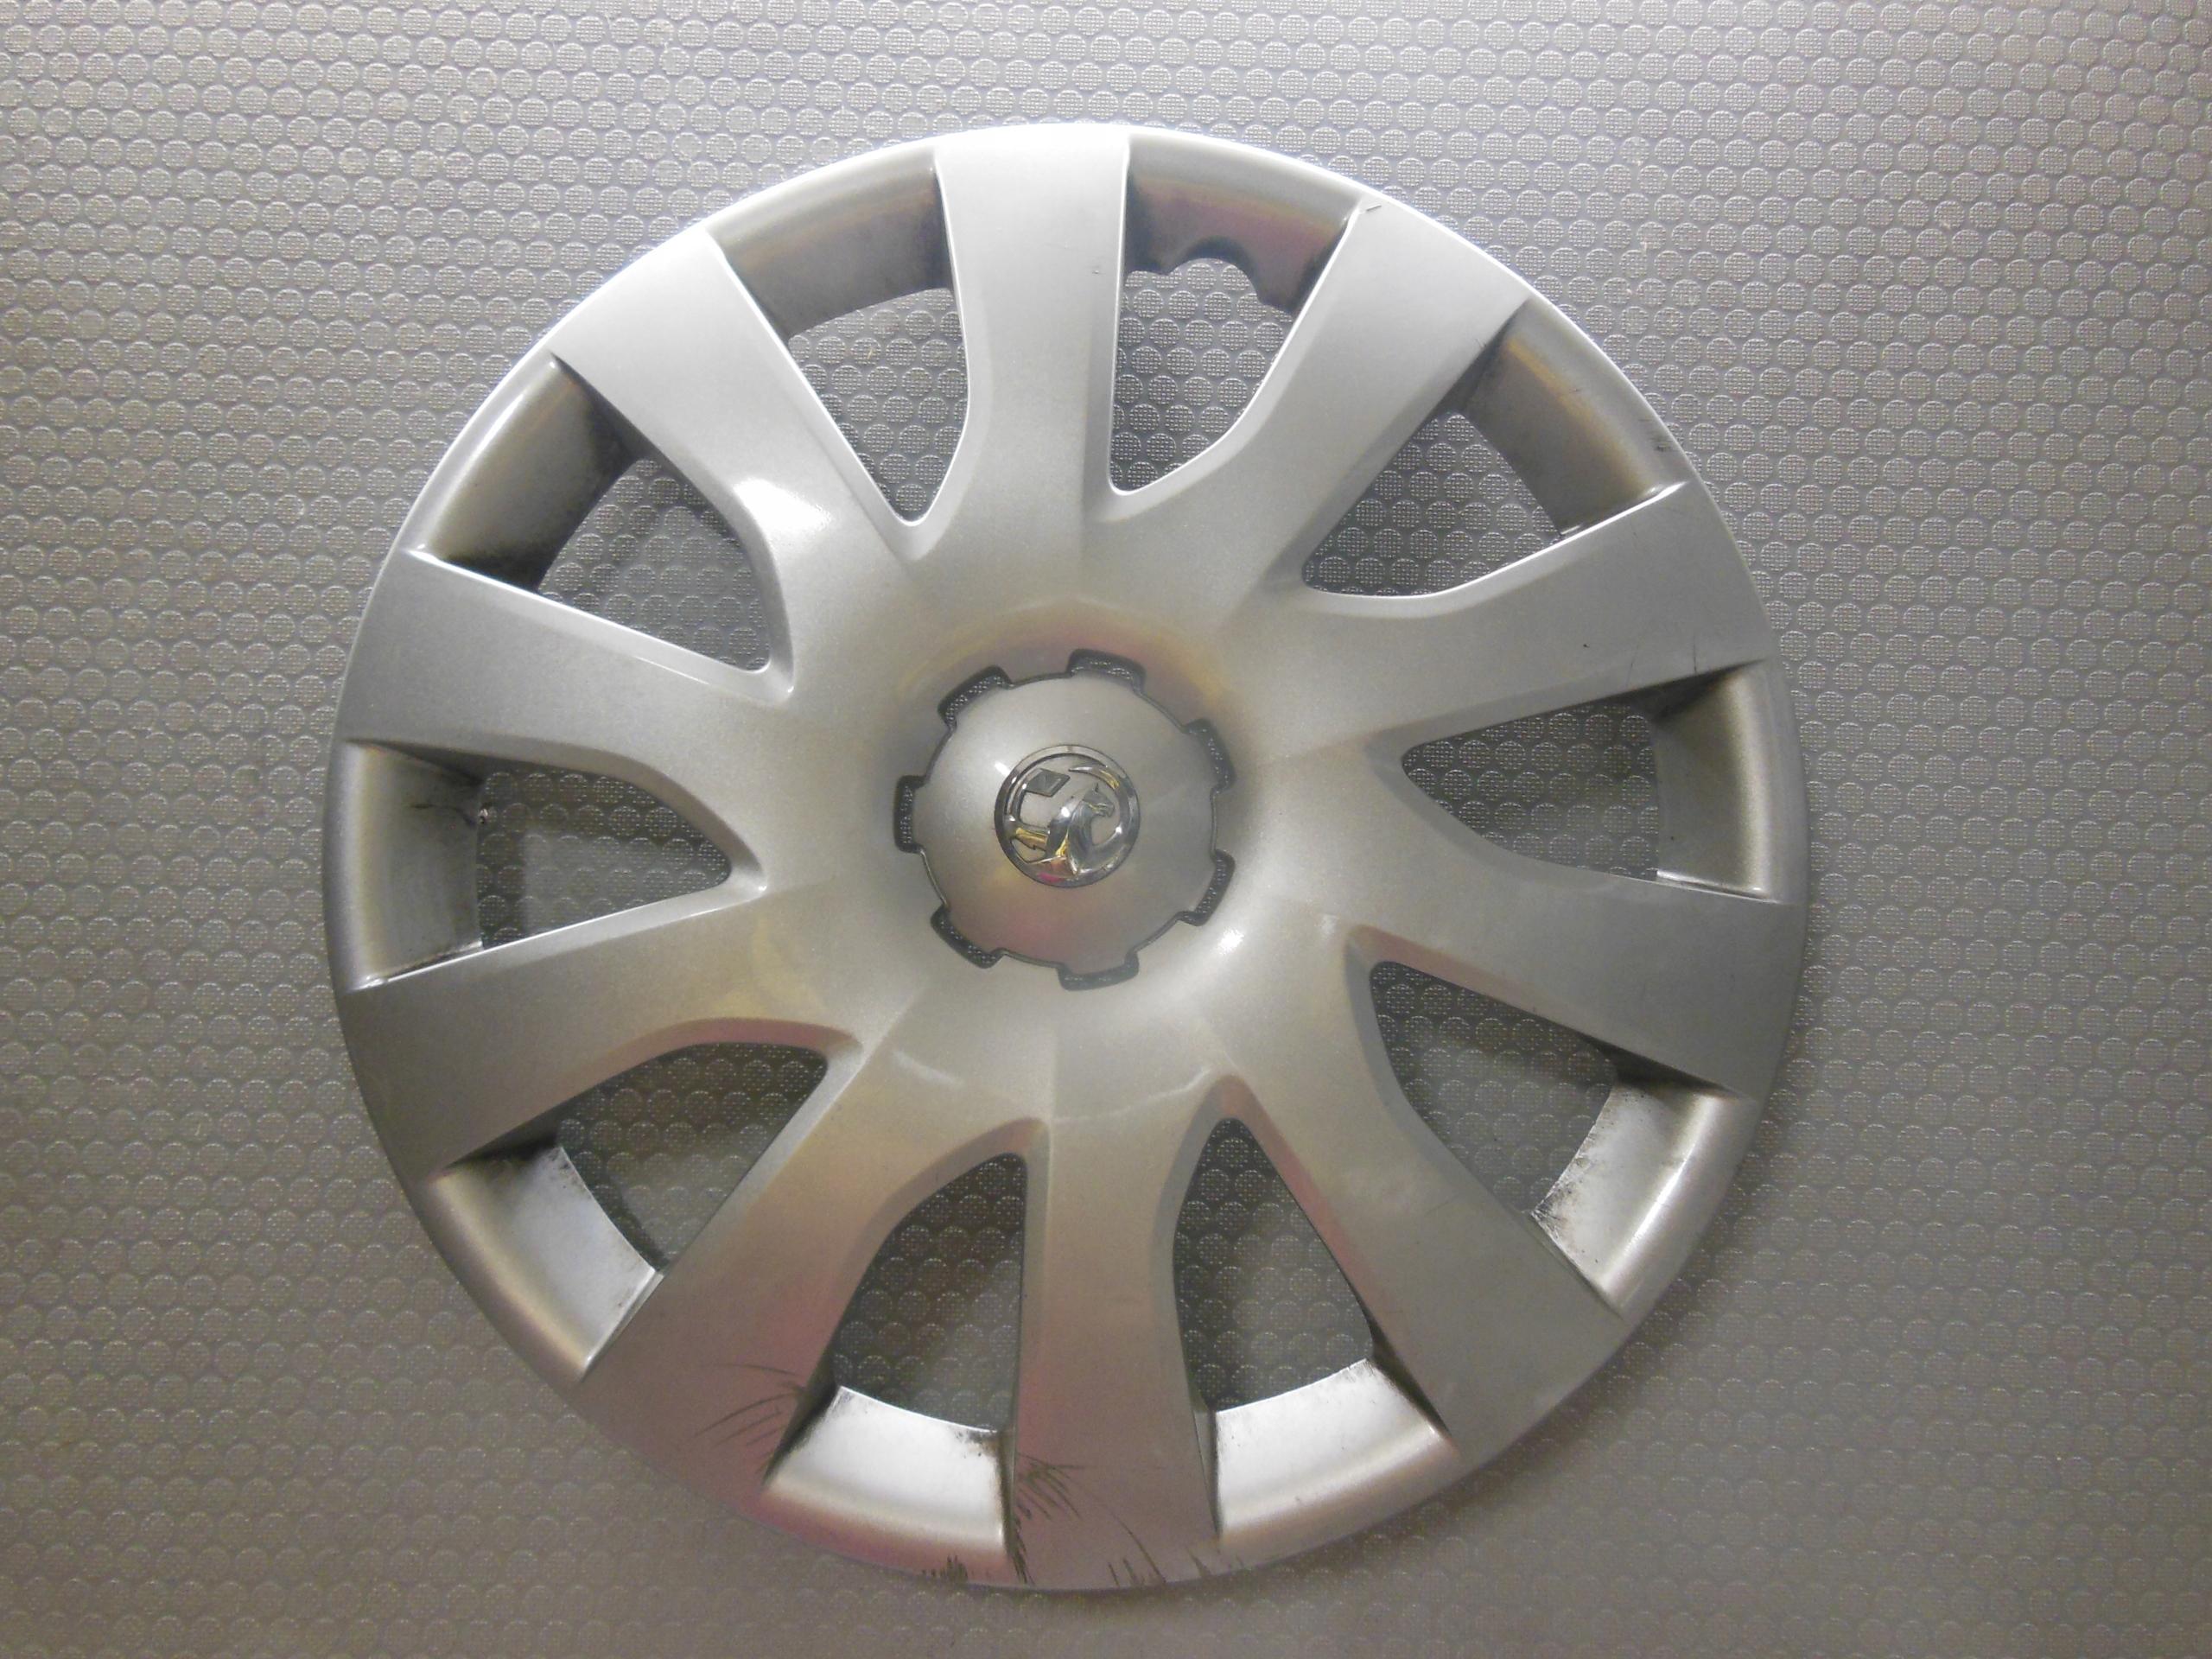 Opel Vivaro Oryginalny kołpak 16'' 40315 4700